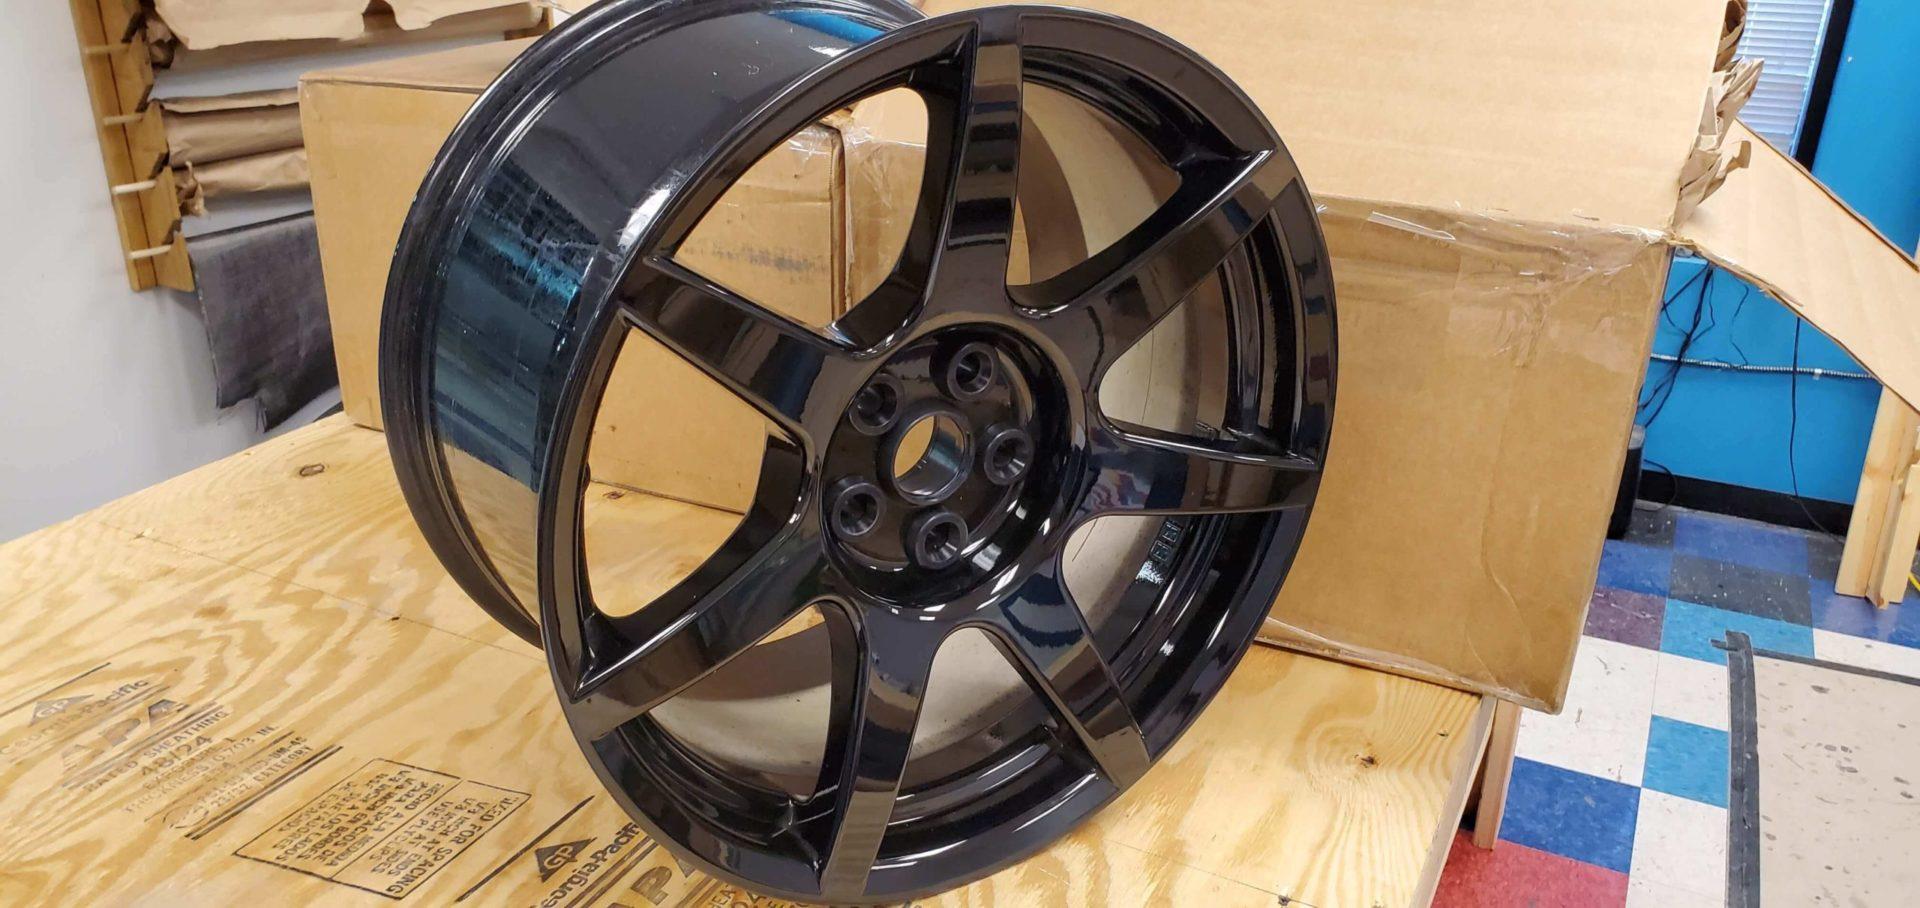 gt350r carbon fiber wheel